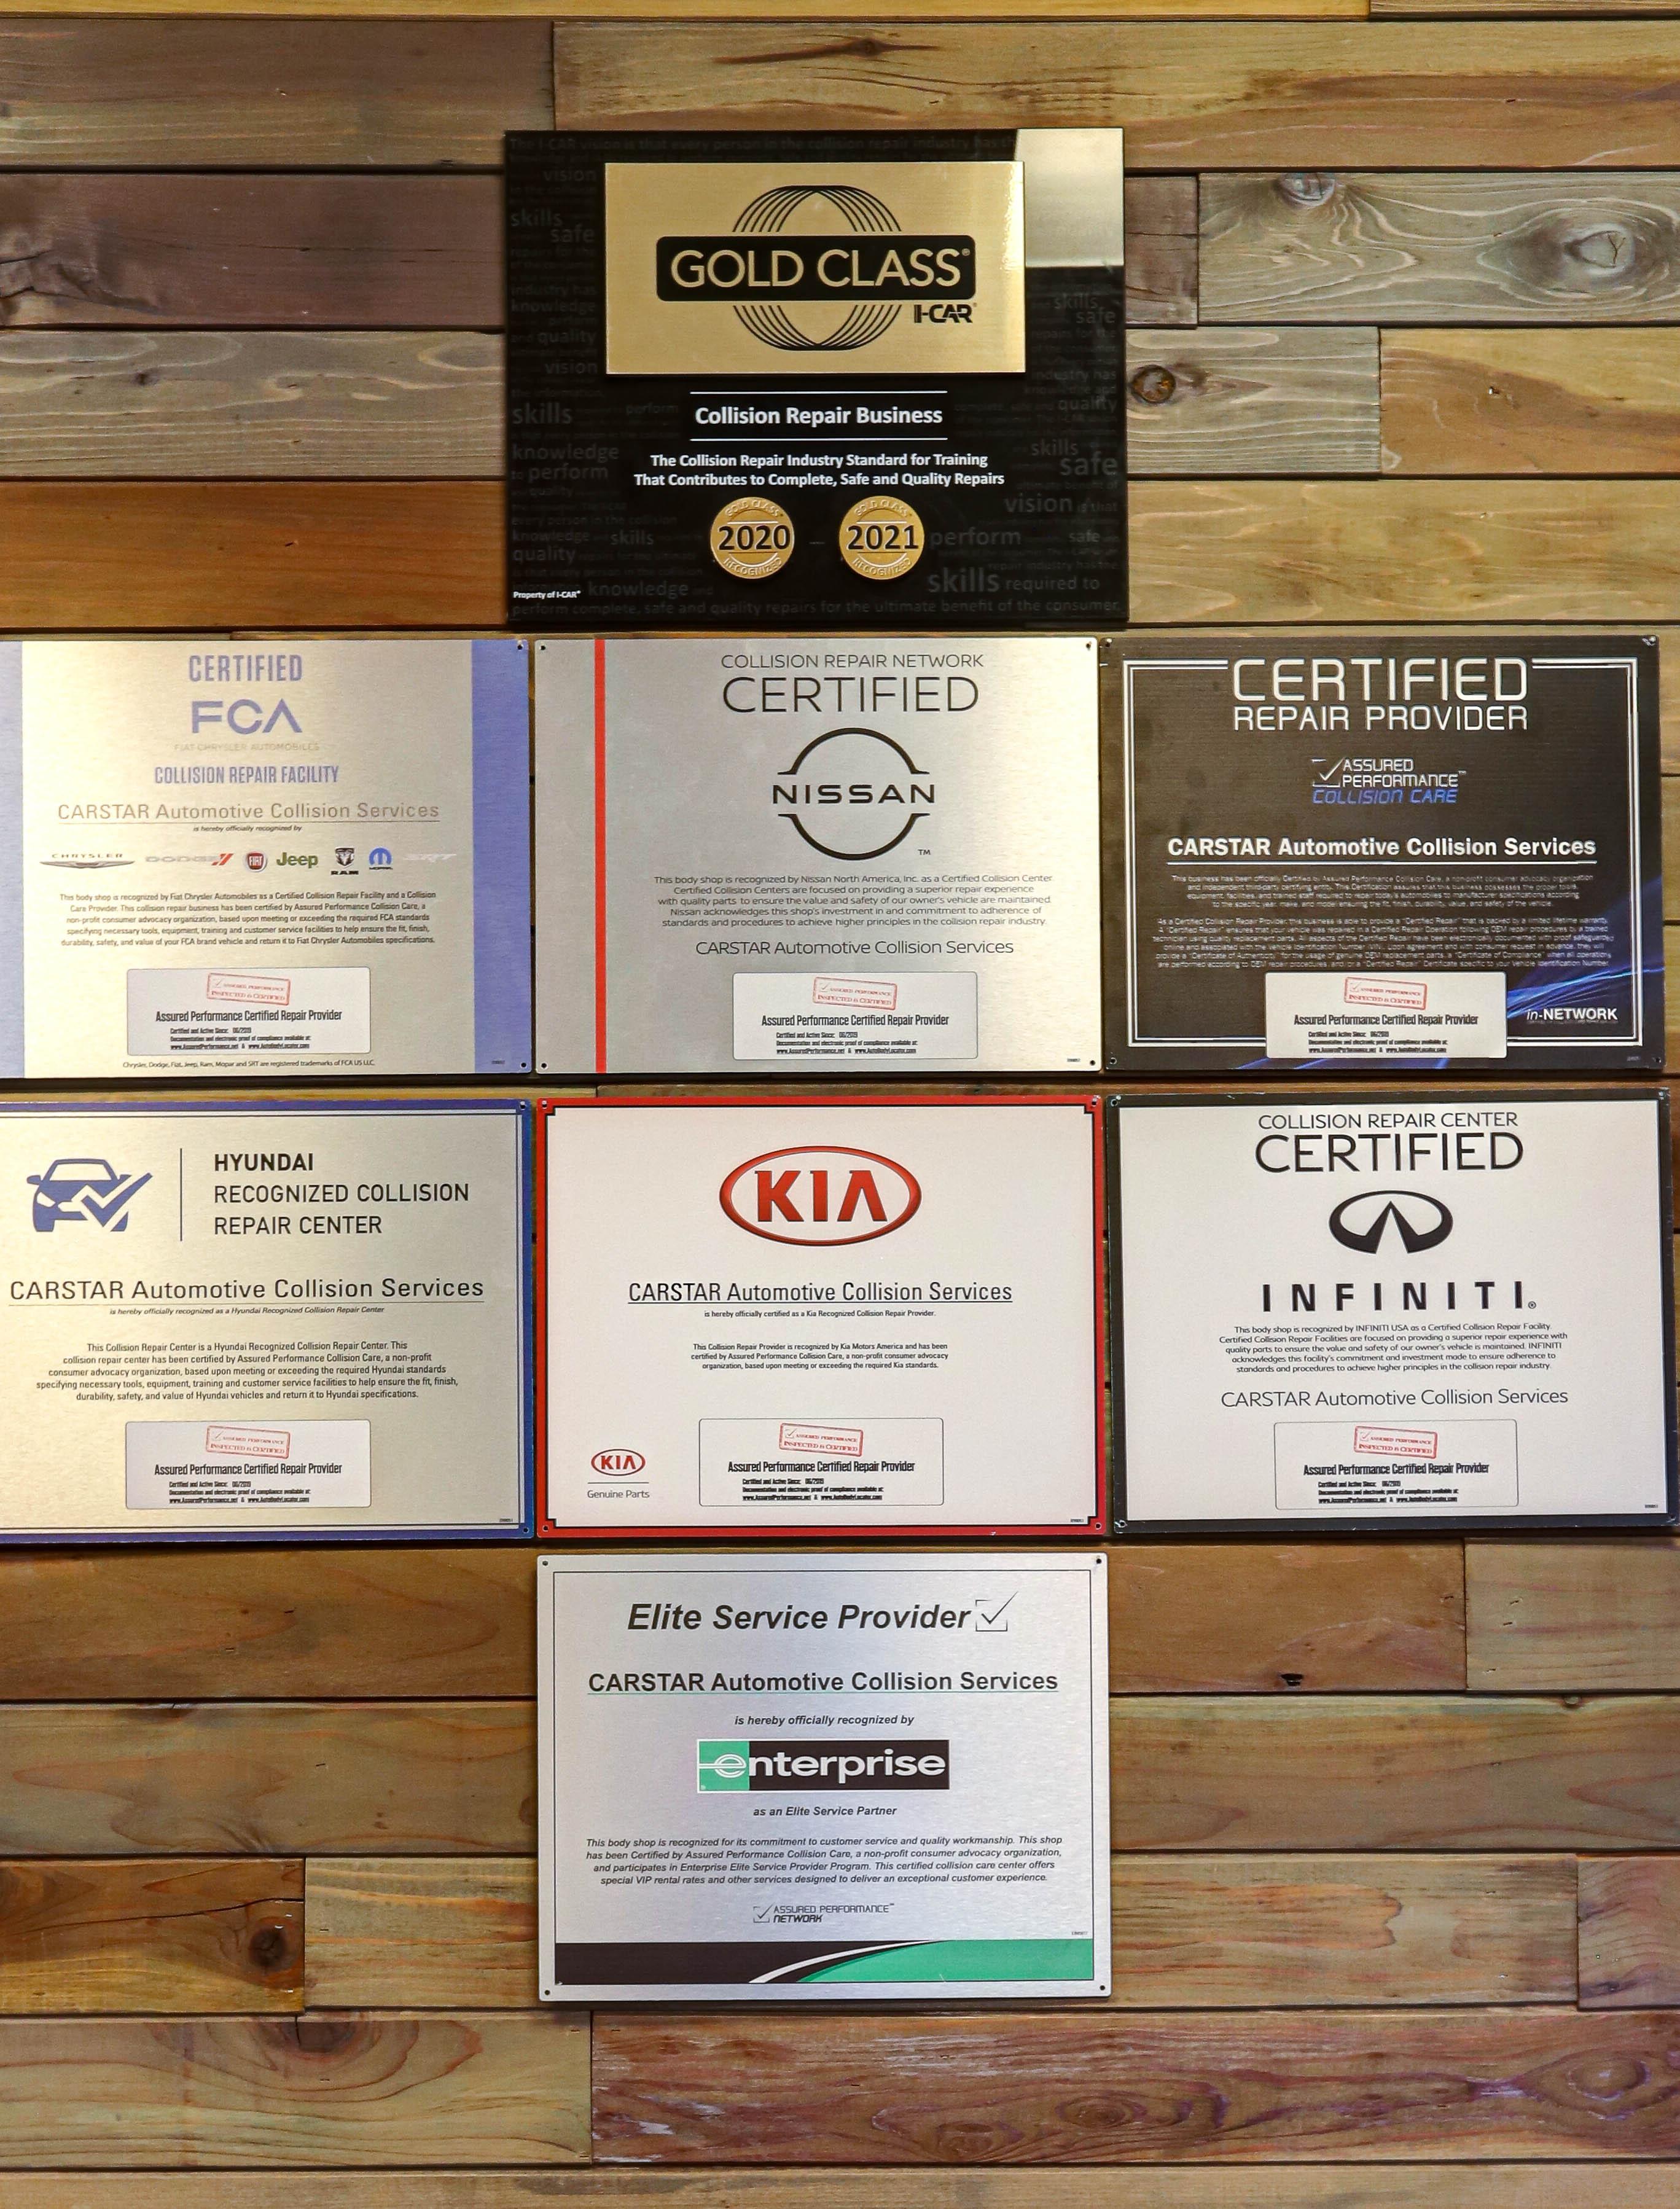 Carstar | Certifications